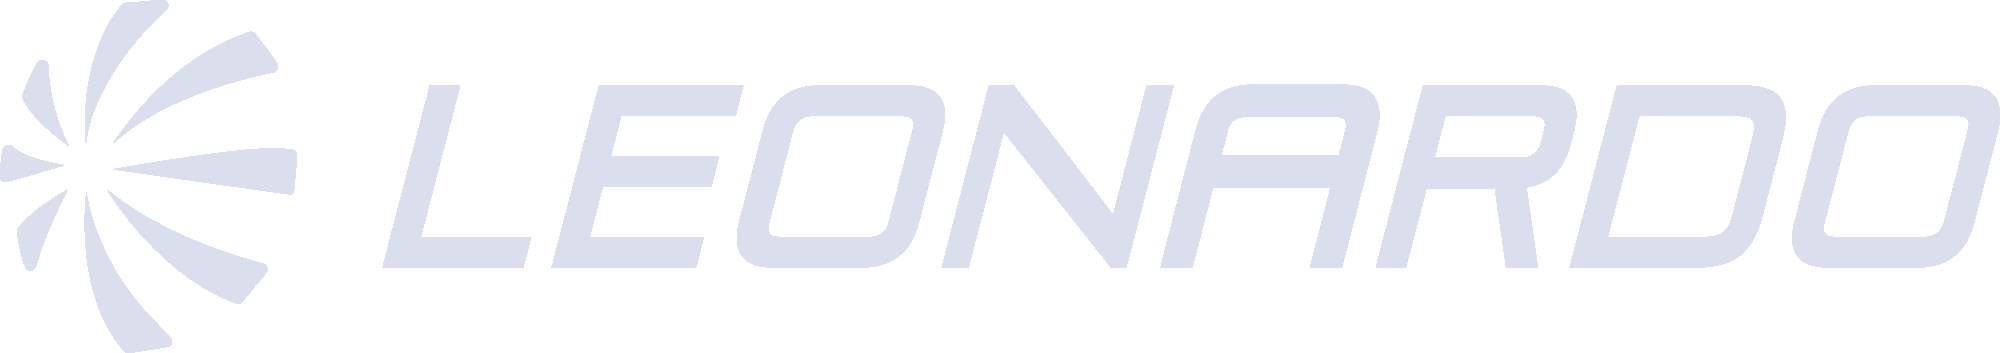 Leonardo logo, one of FifthIngenium clients